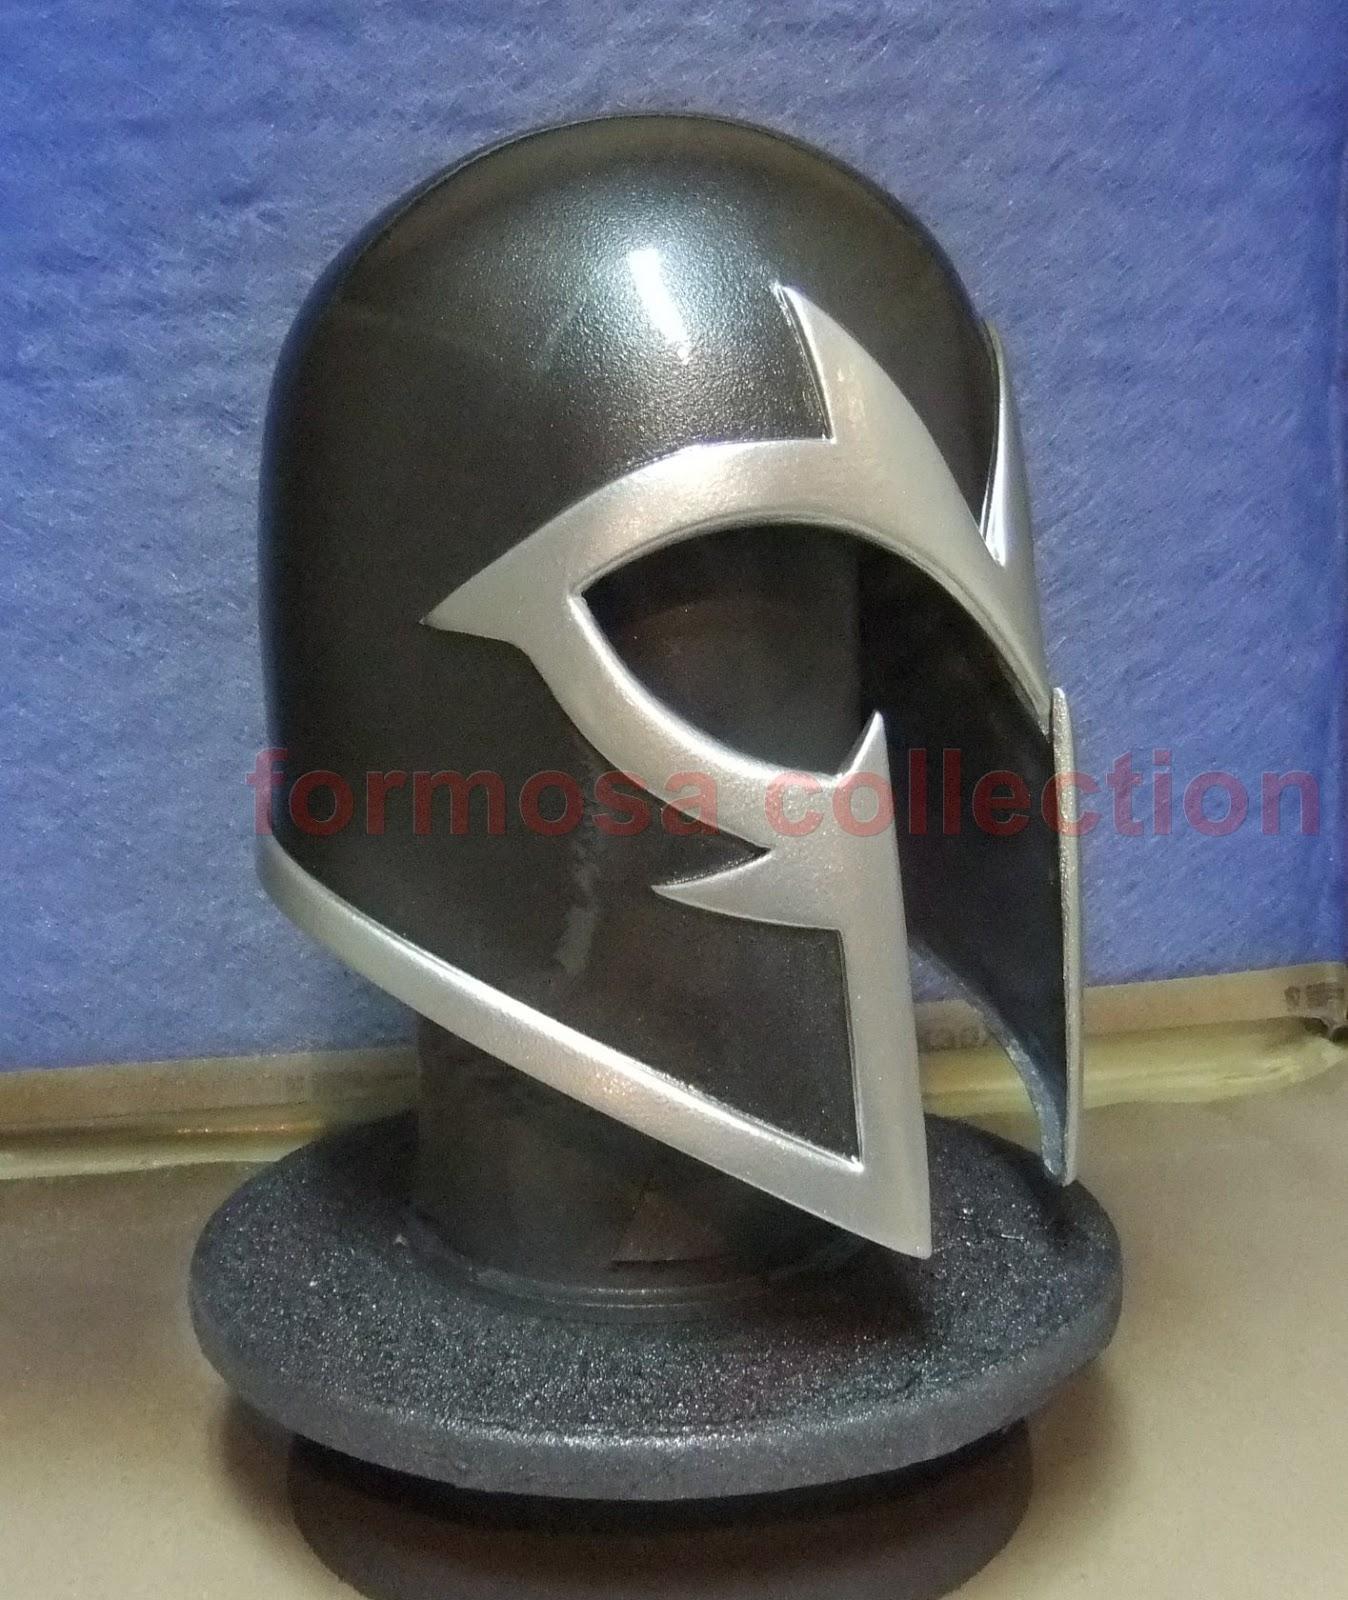 formosacollection x men first class magneto helmet build 3